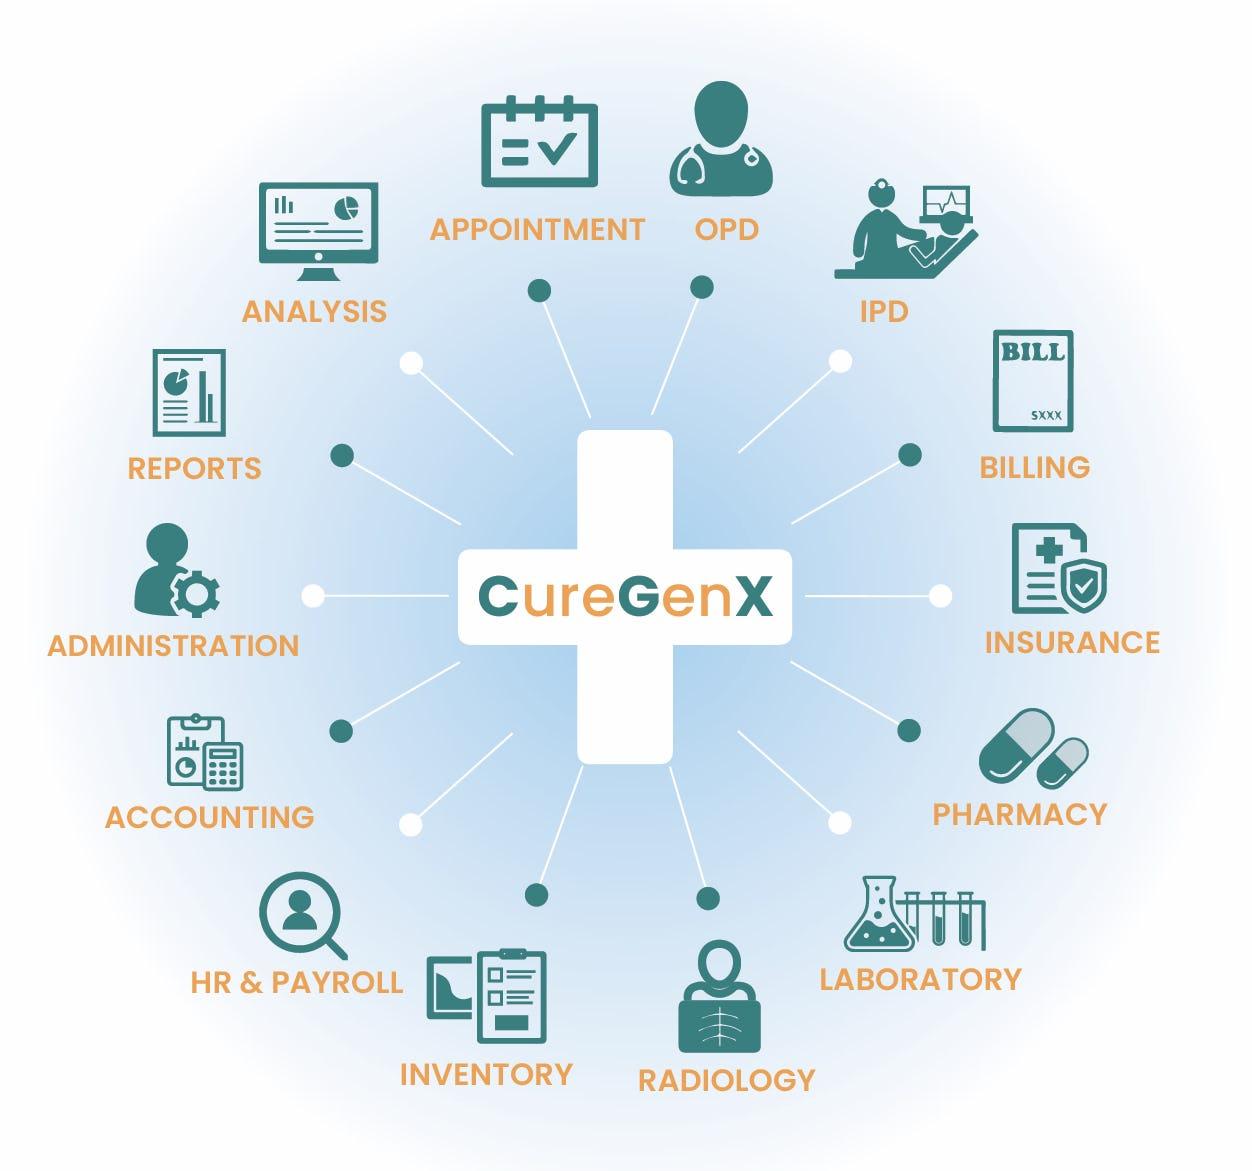 CureGenX